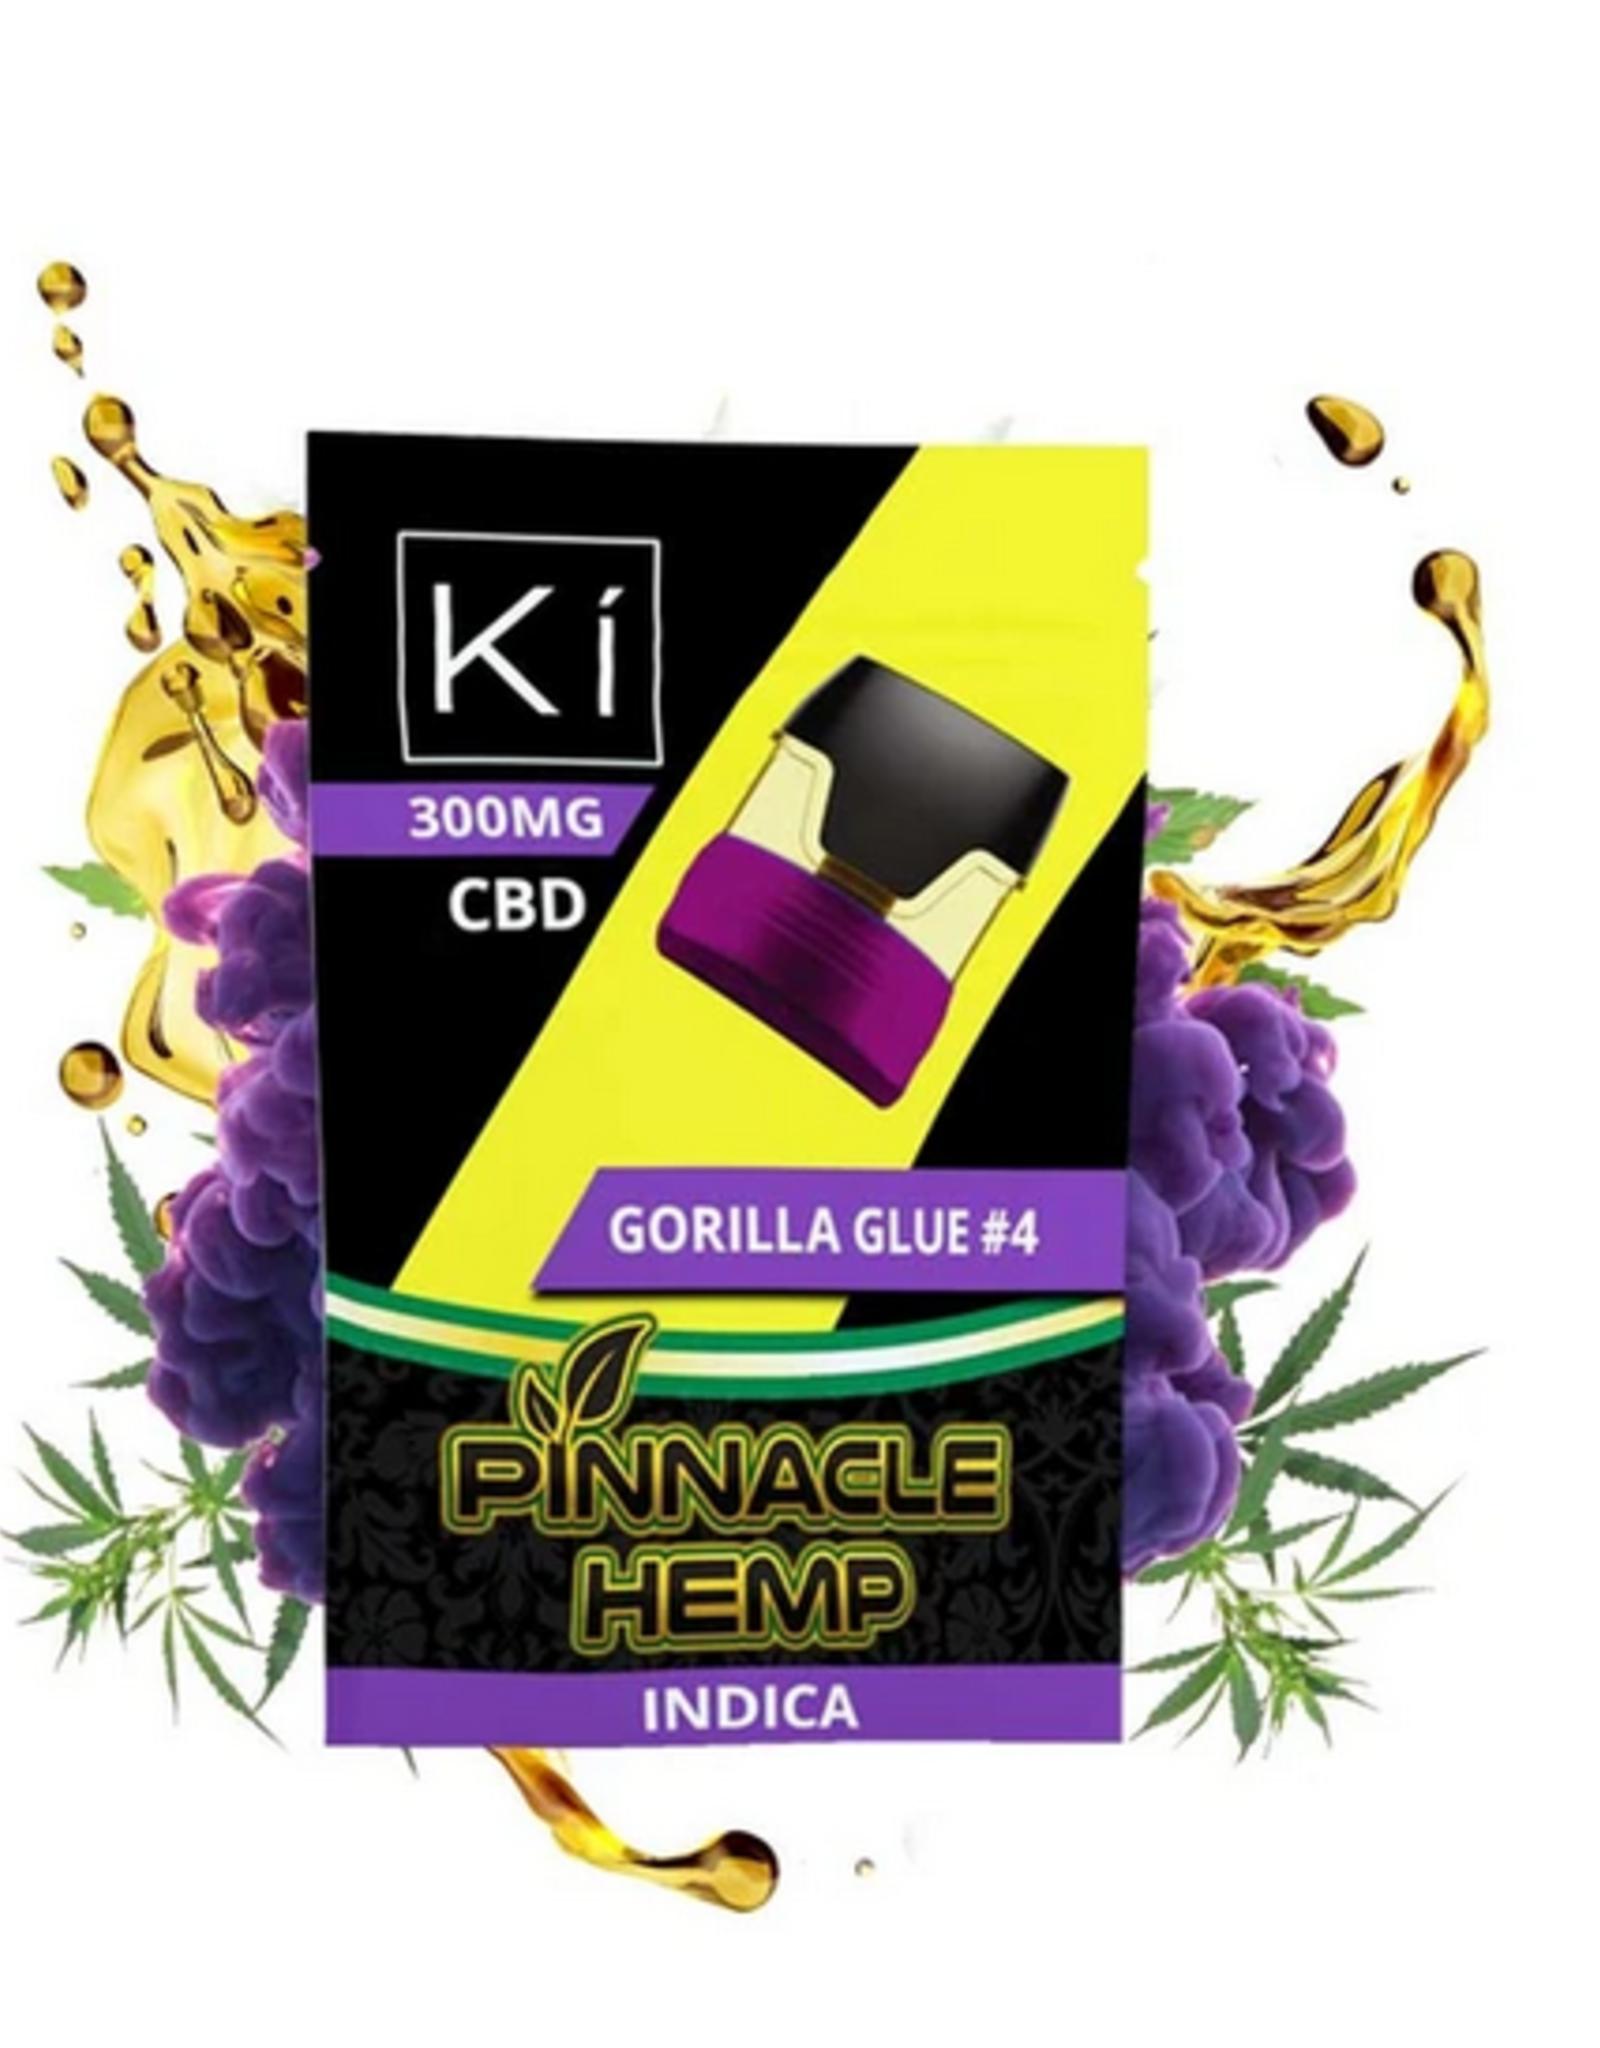 Pinnacle Hemp Full Spectrum Gorilla Glue#4 Ki Pod, Indica 300mg